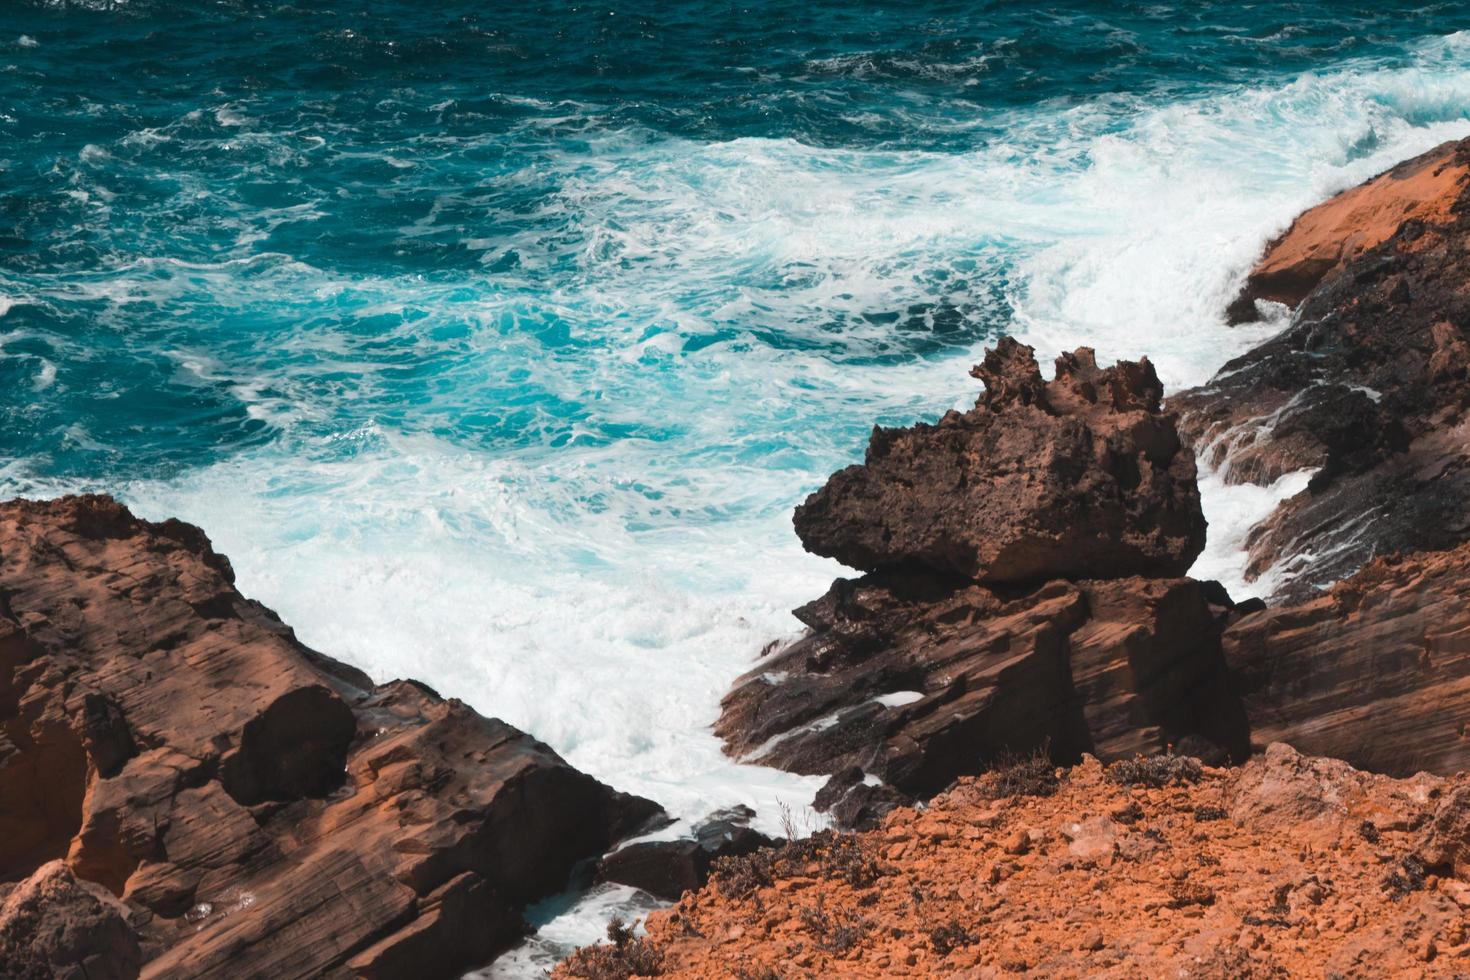 vågor kraschar i stenig strand foto